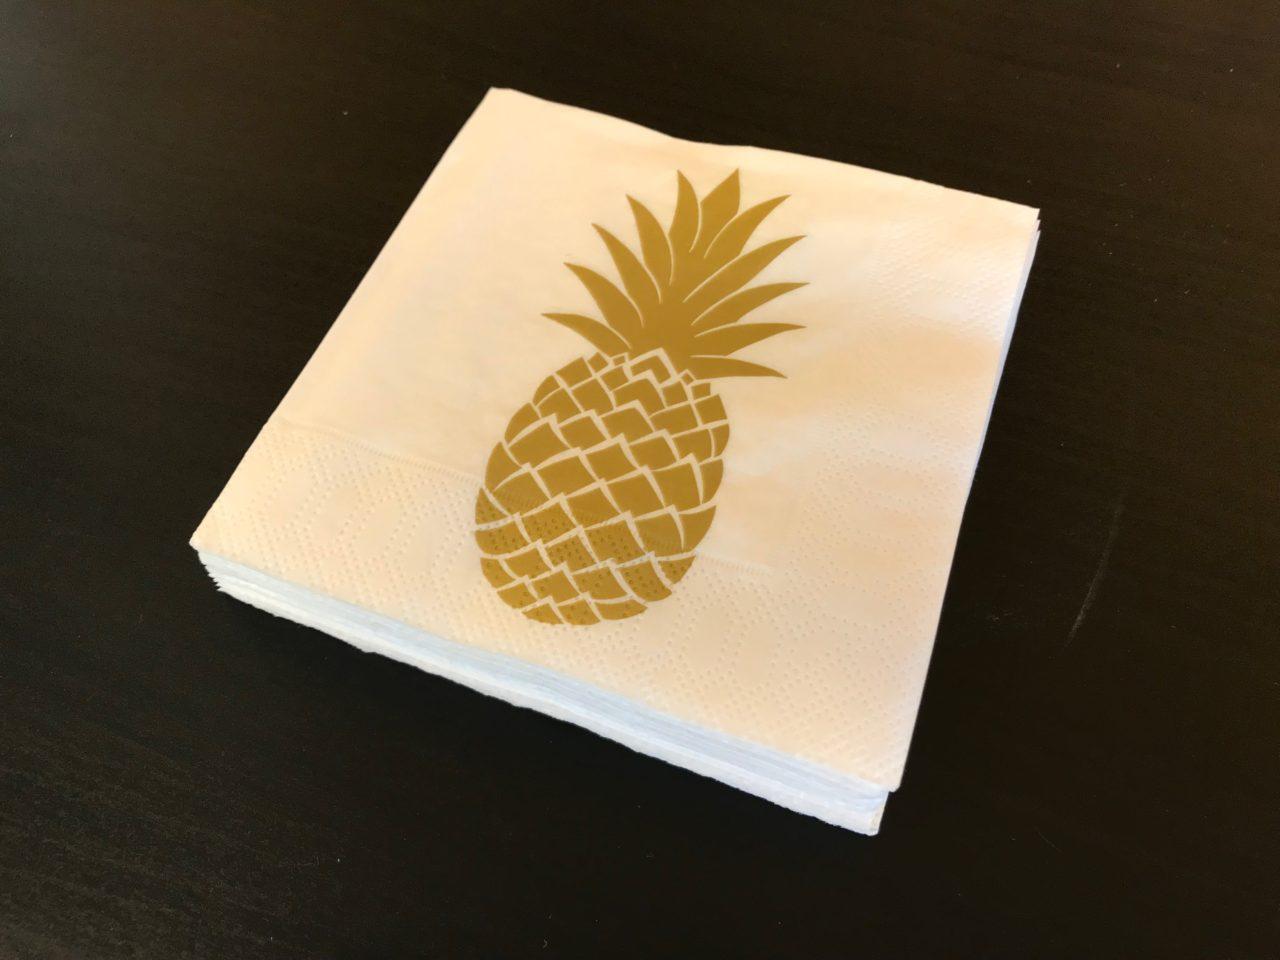 Golden Pineapple Napkin On A Black Table